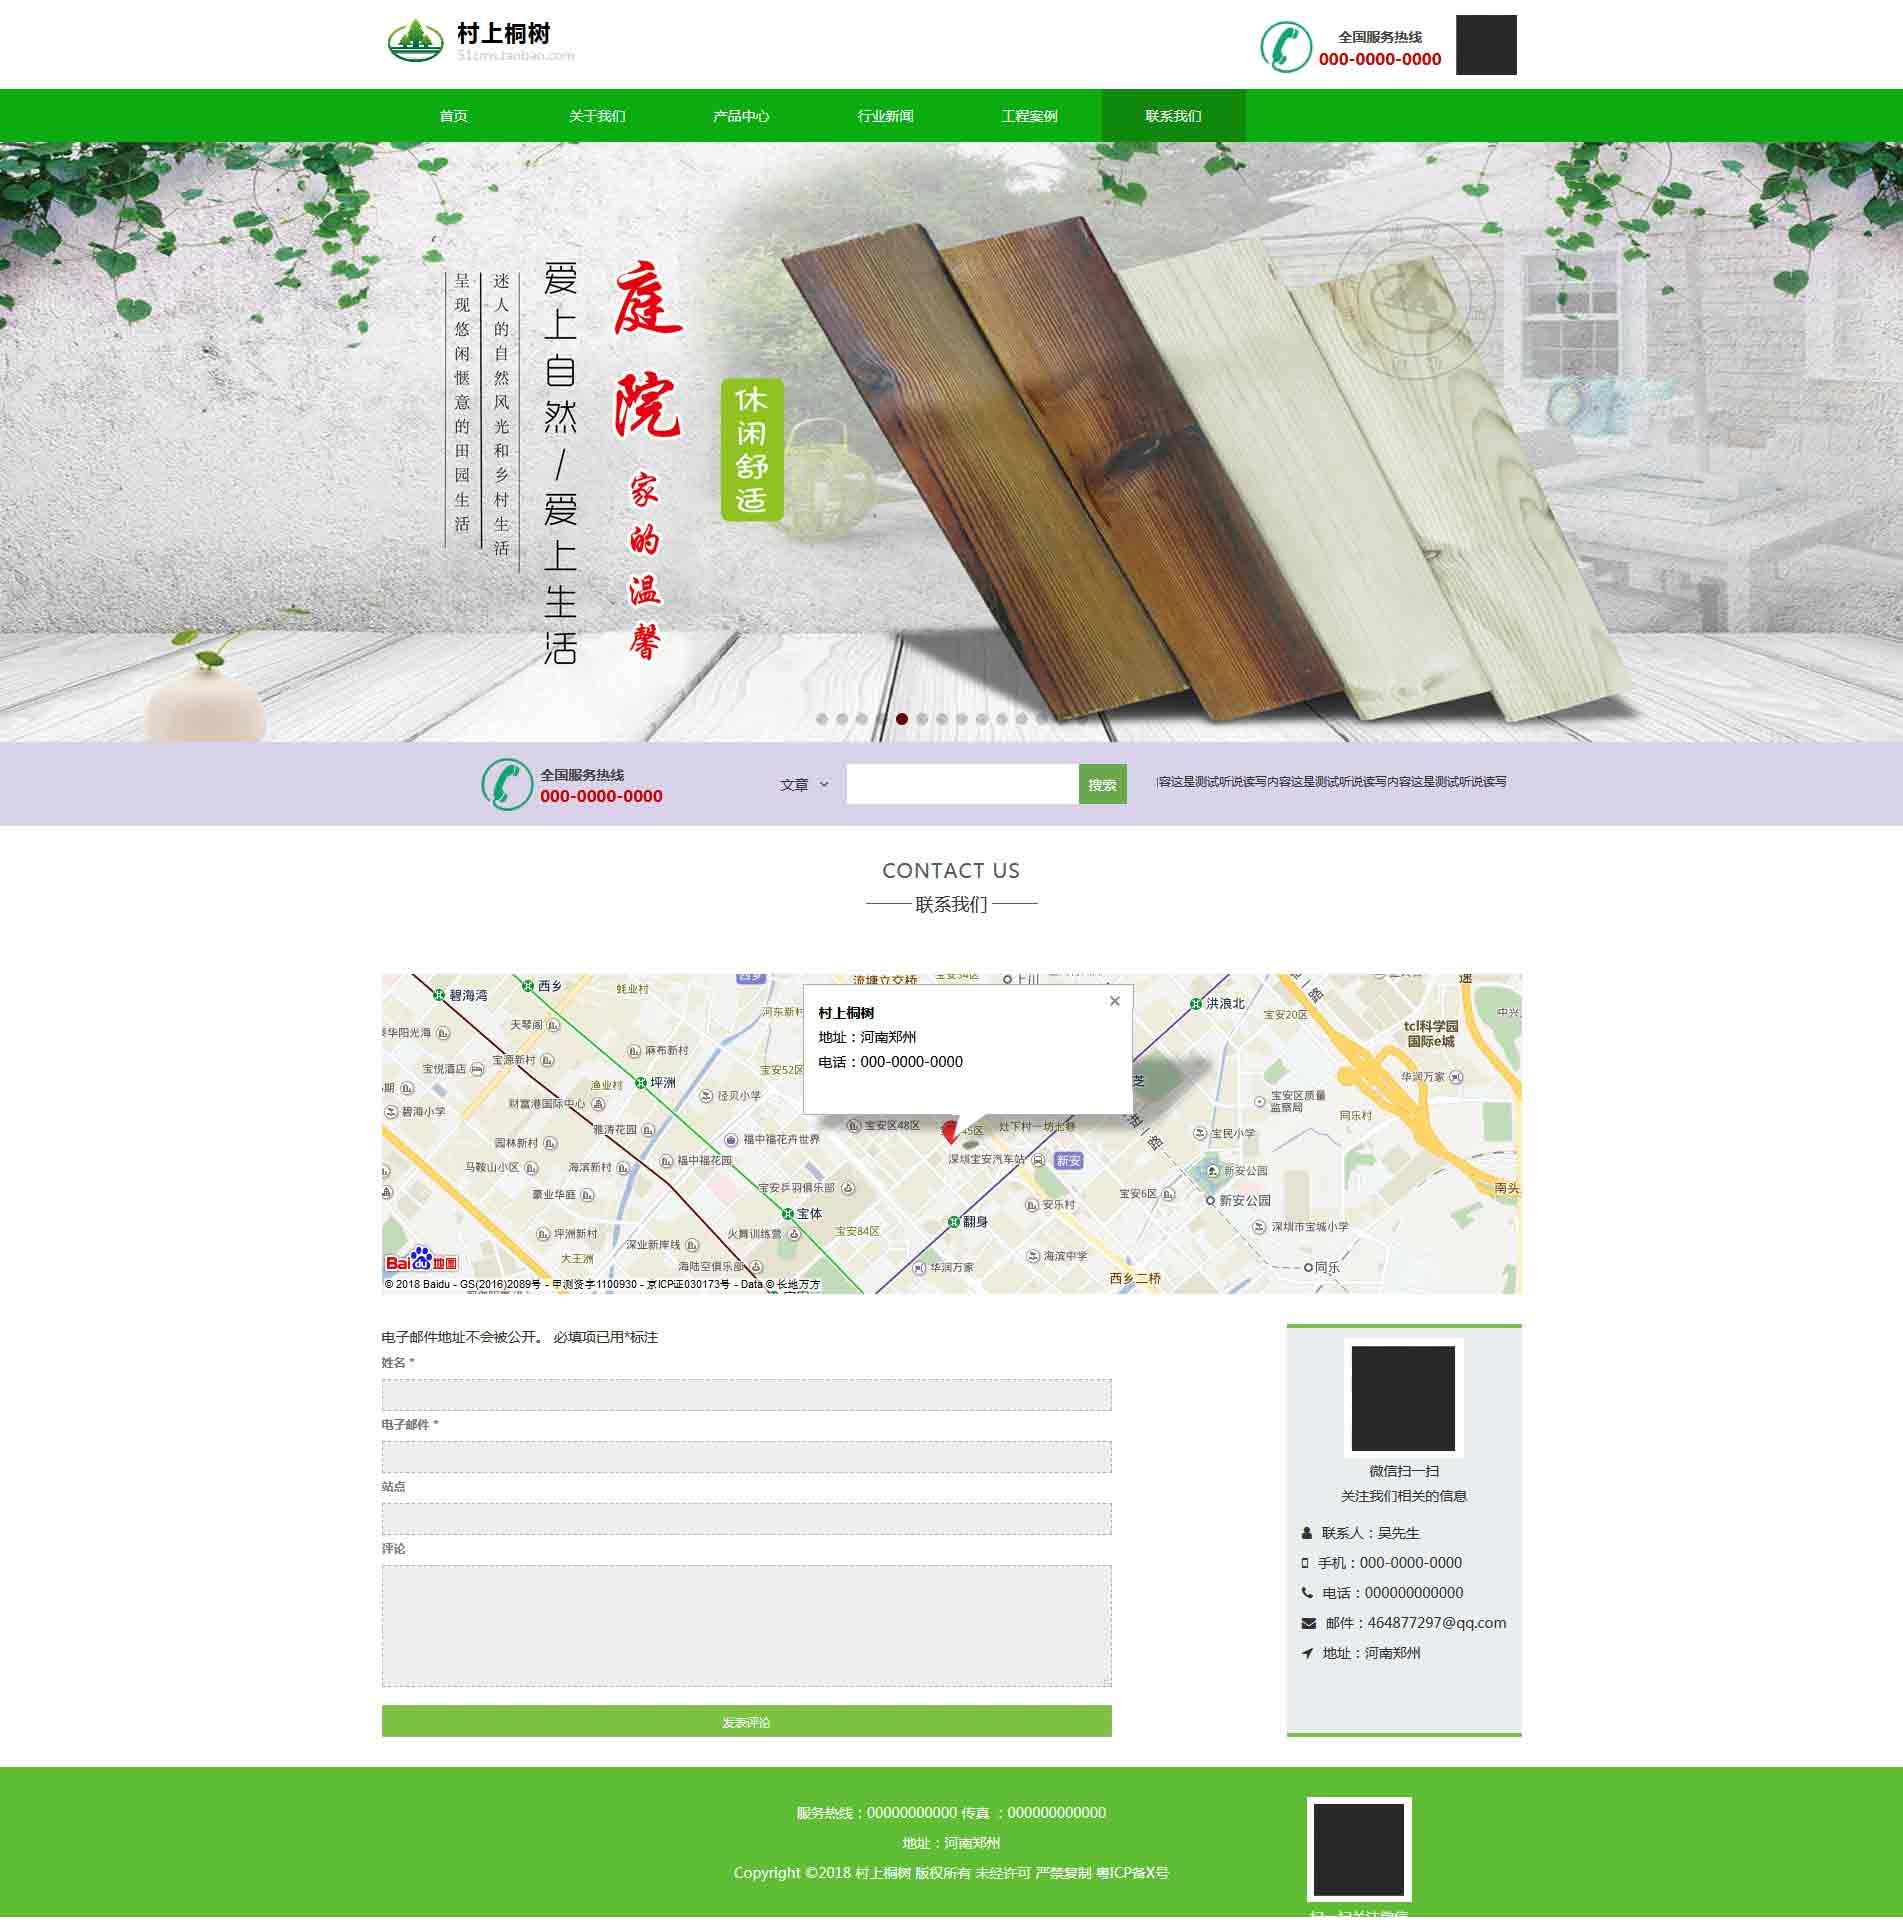 wordpress企业建站3合1布局,企业建站一条龙